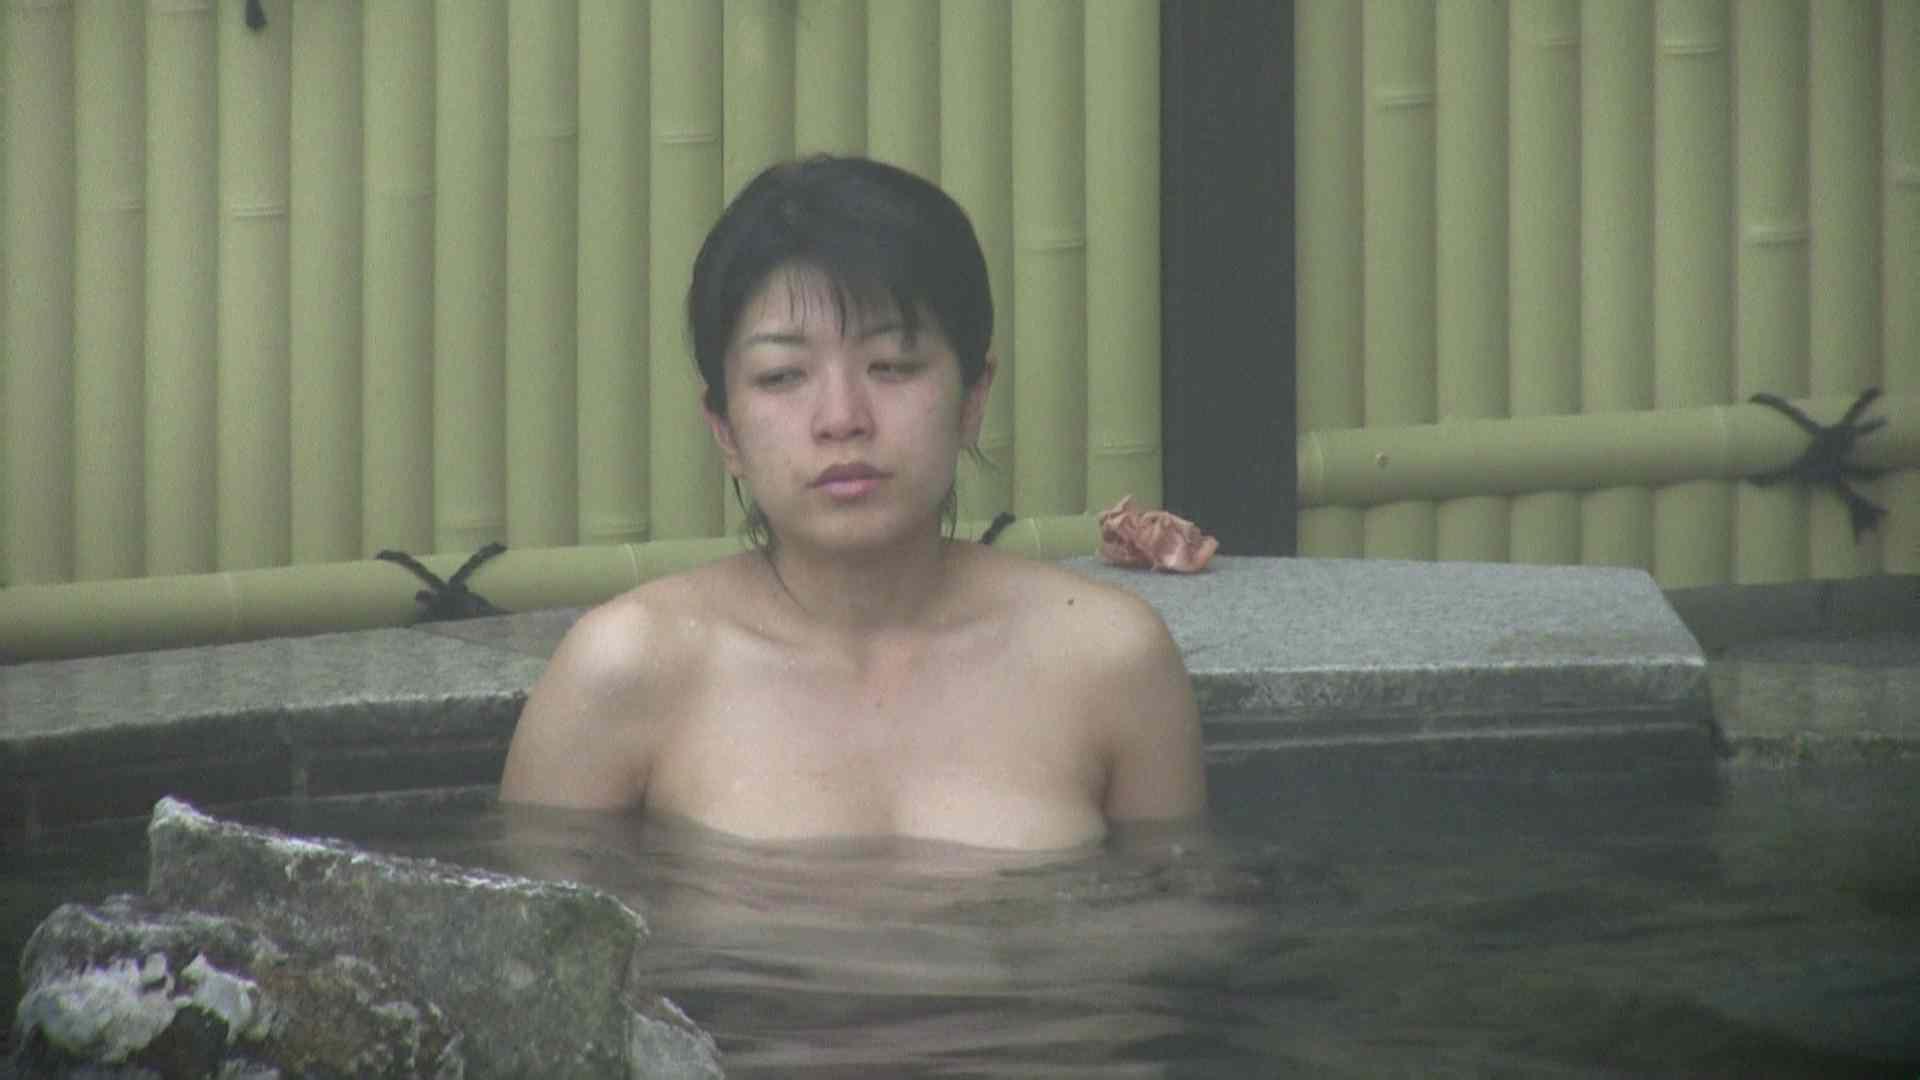 Aquaな露天風呂Vol.585 HなOL | 盗撮  93pic 85